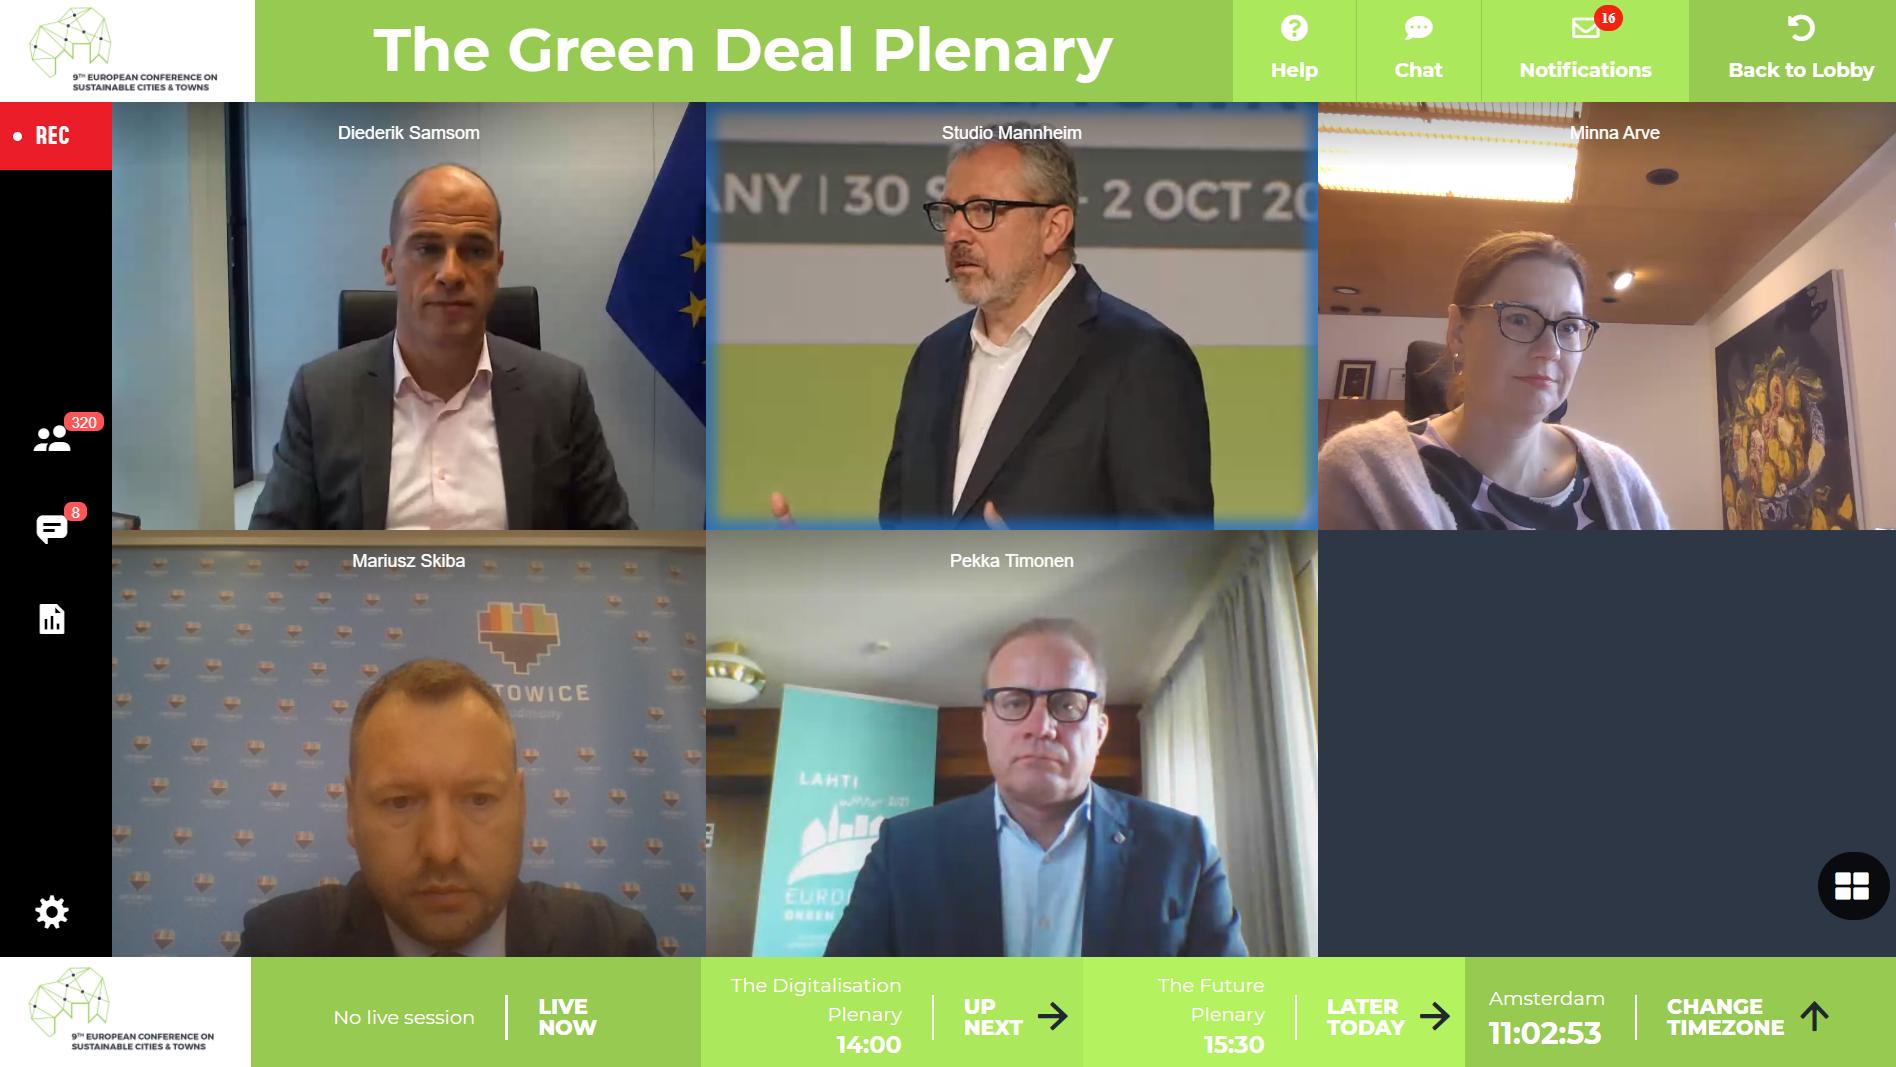 Sprecher*innen im Green Deal Plenum.